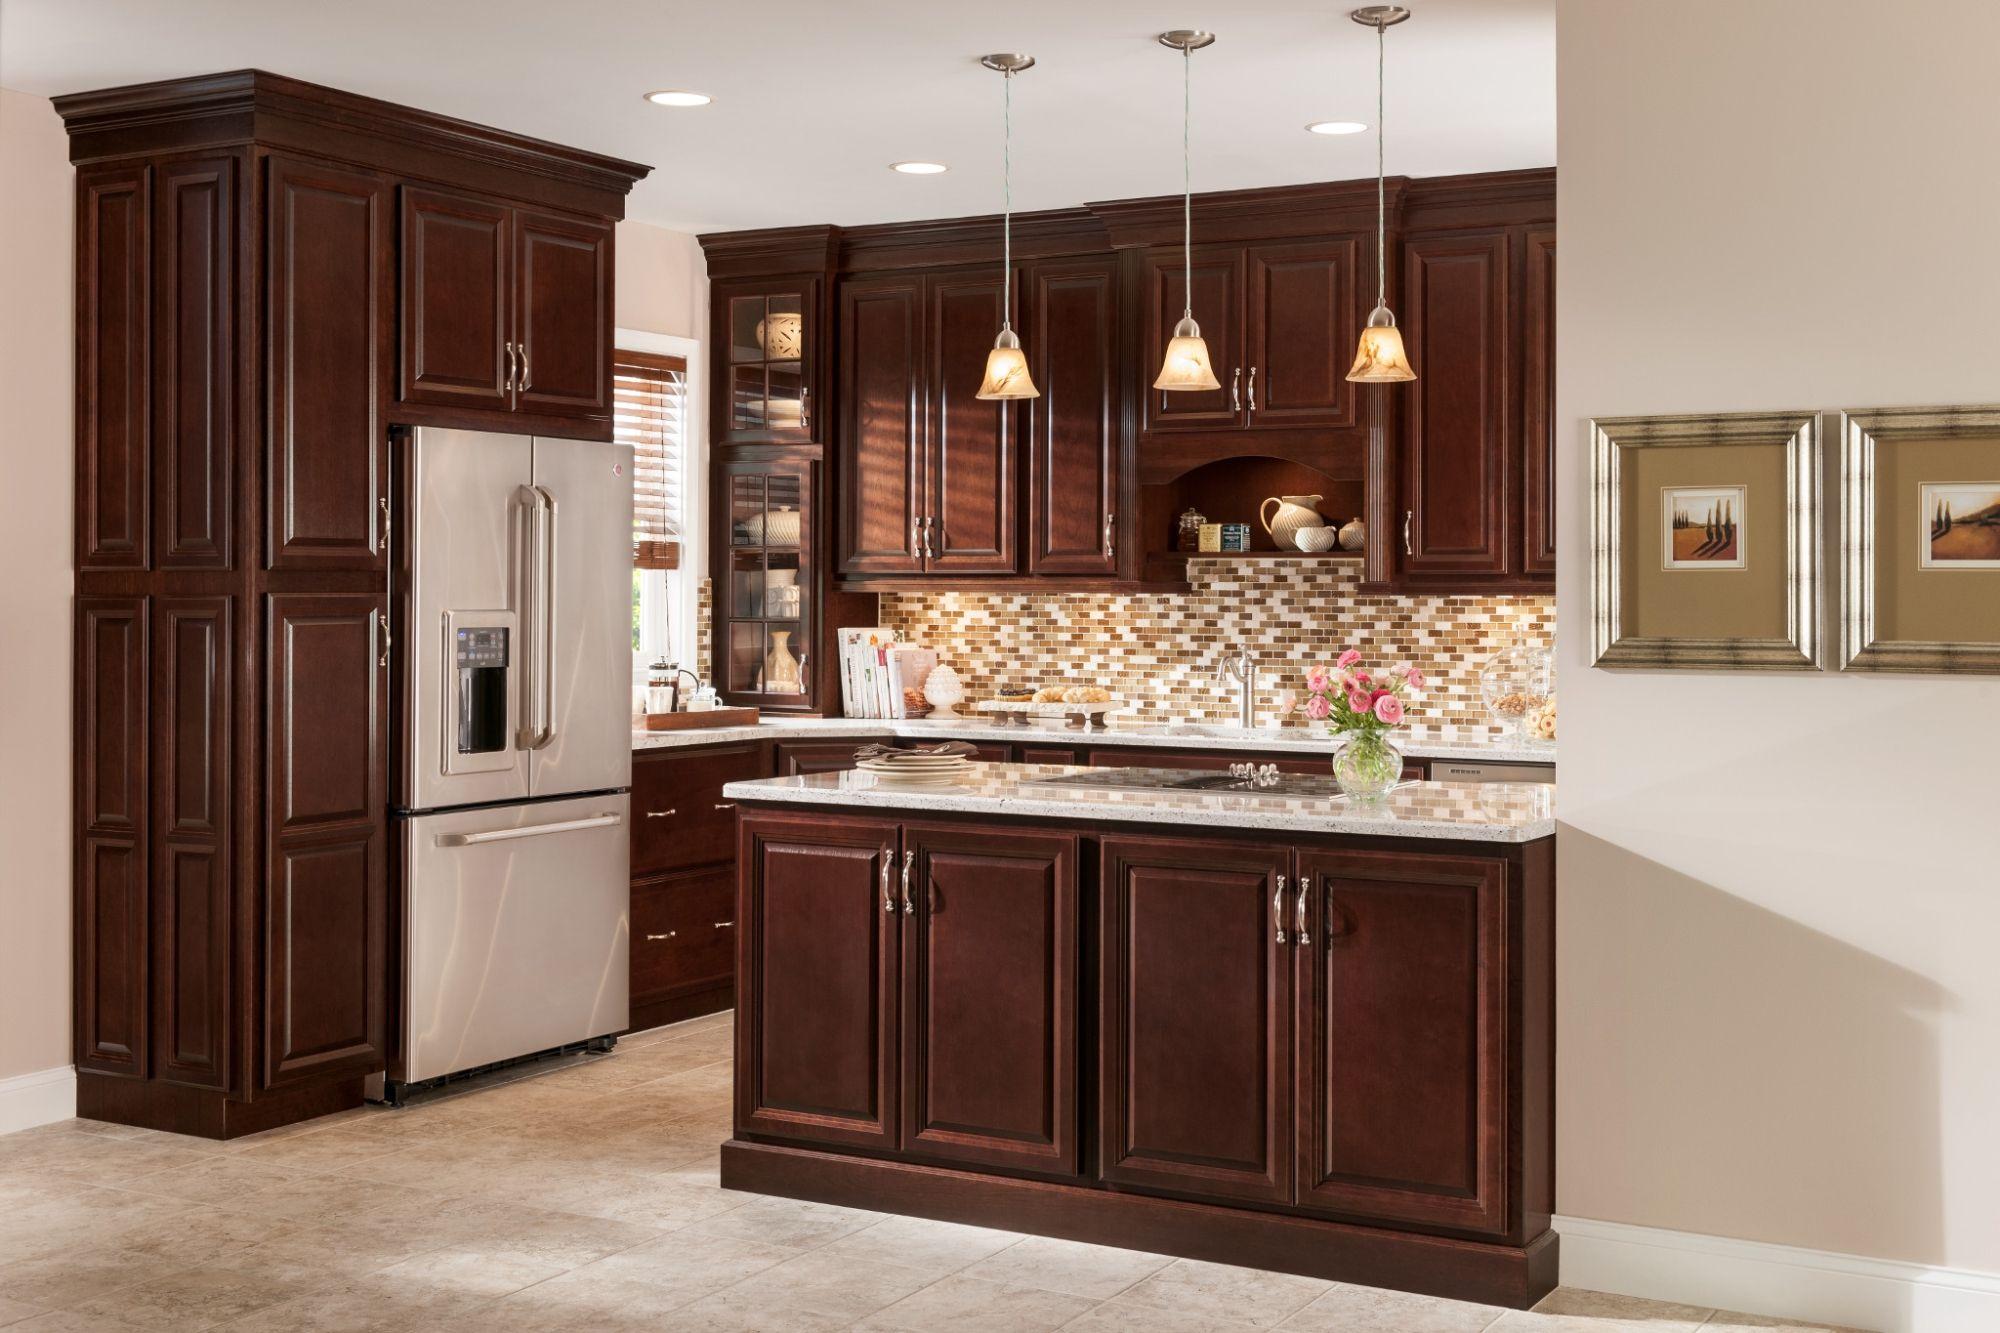 Portland | Semi custom kitchen cabinets, Inexpensive ...